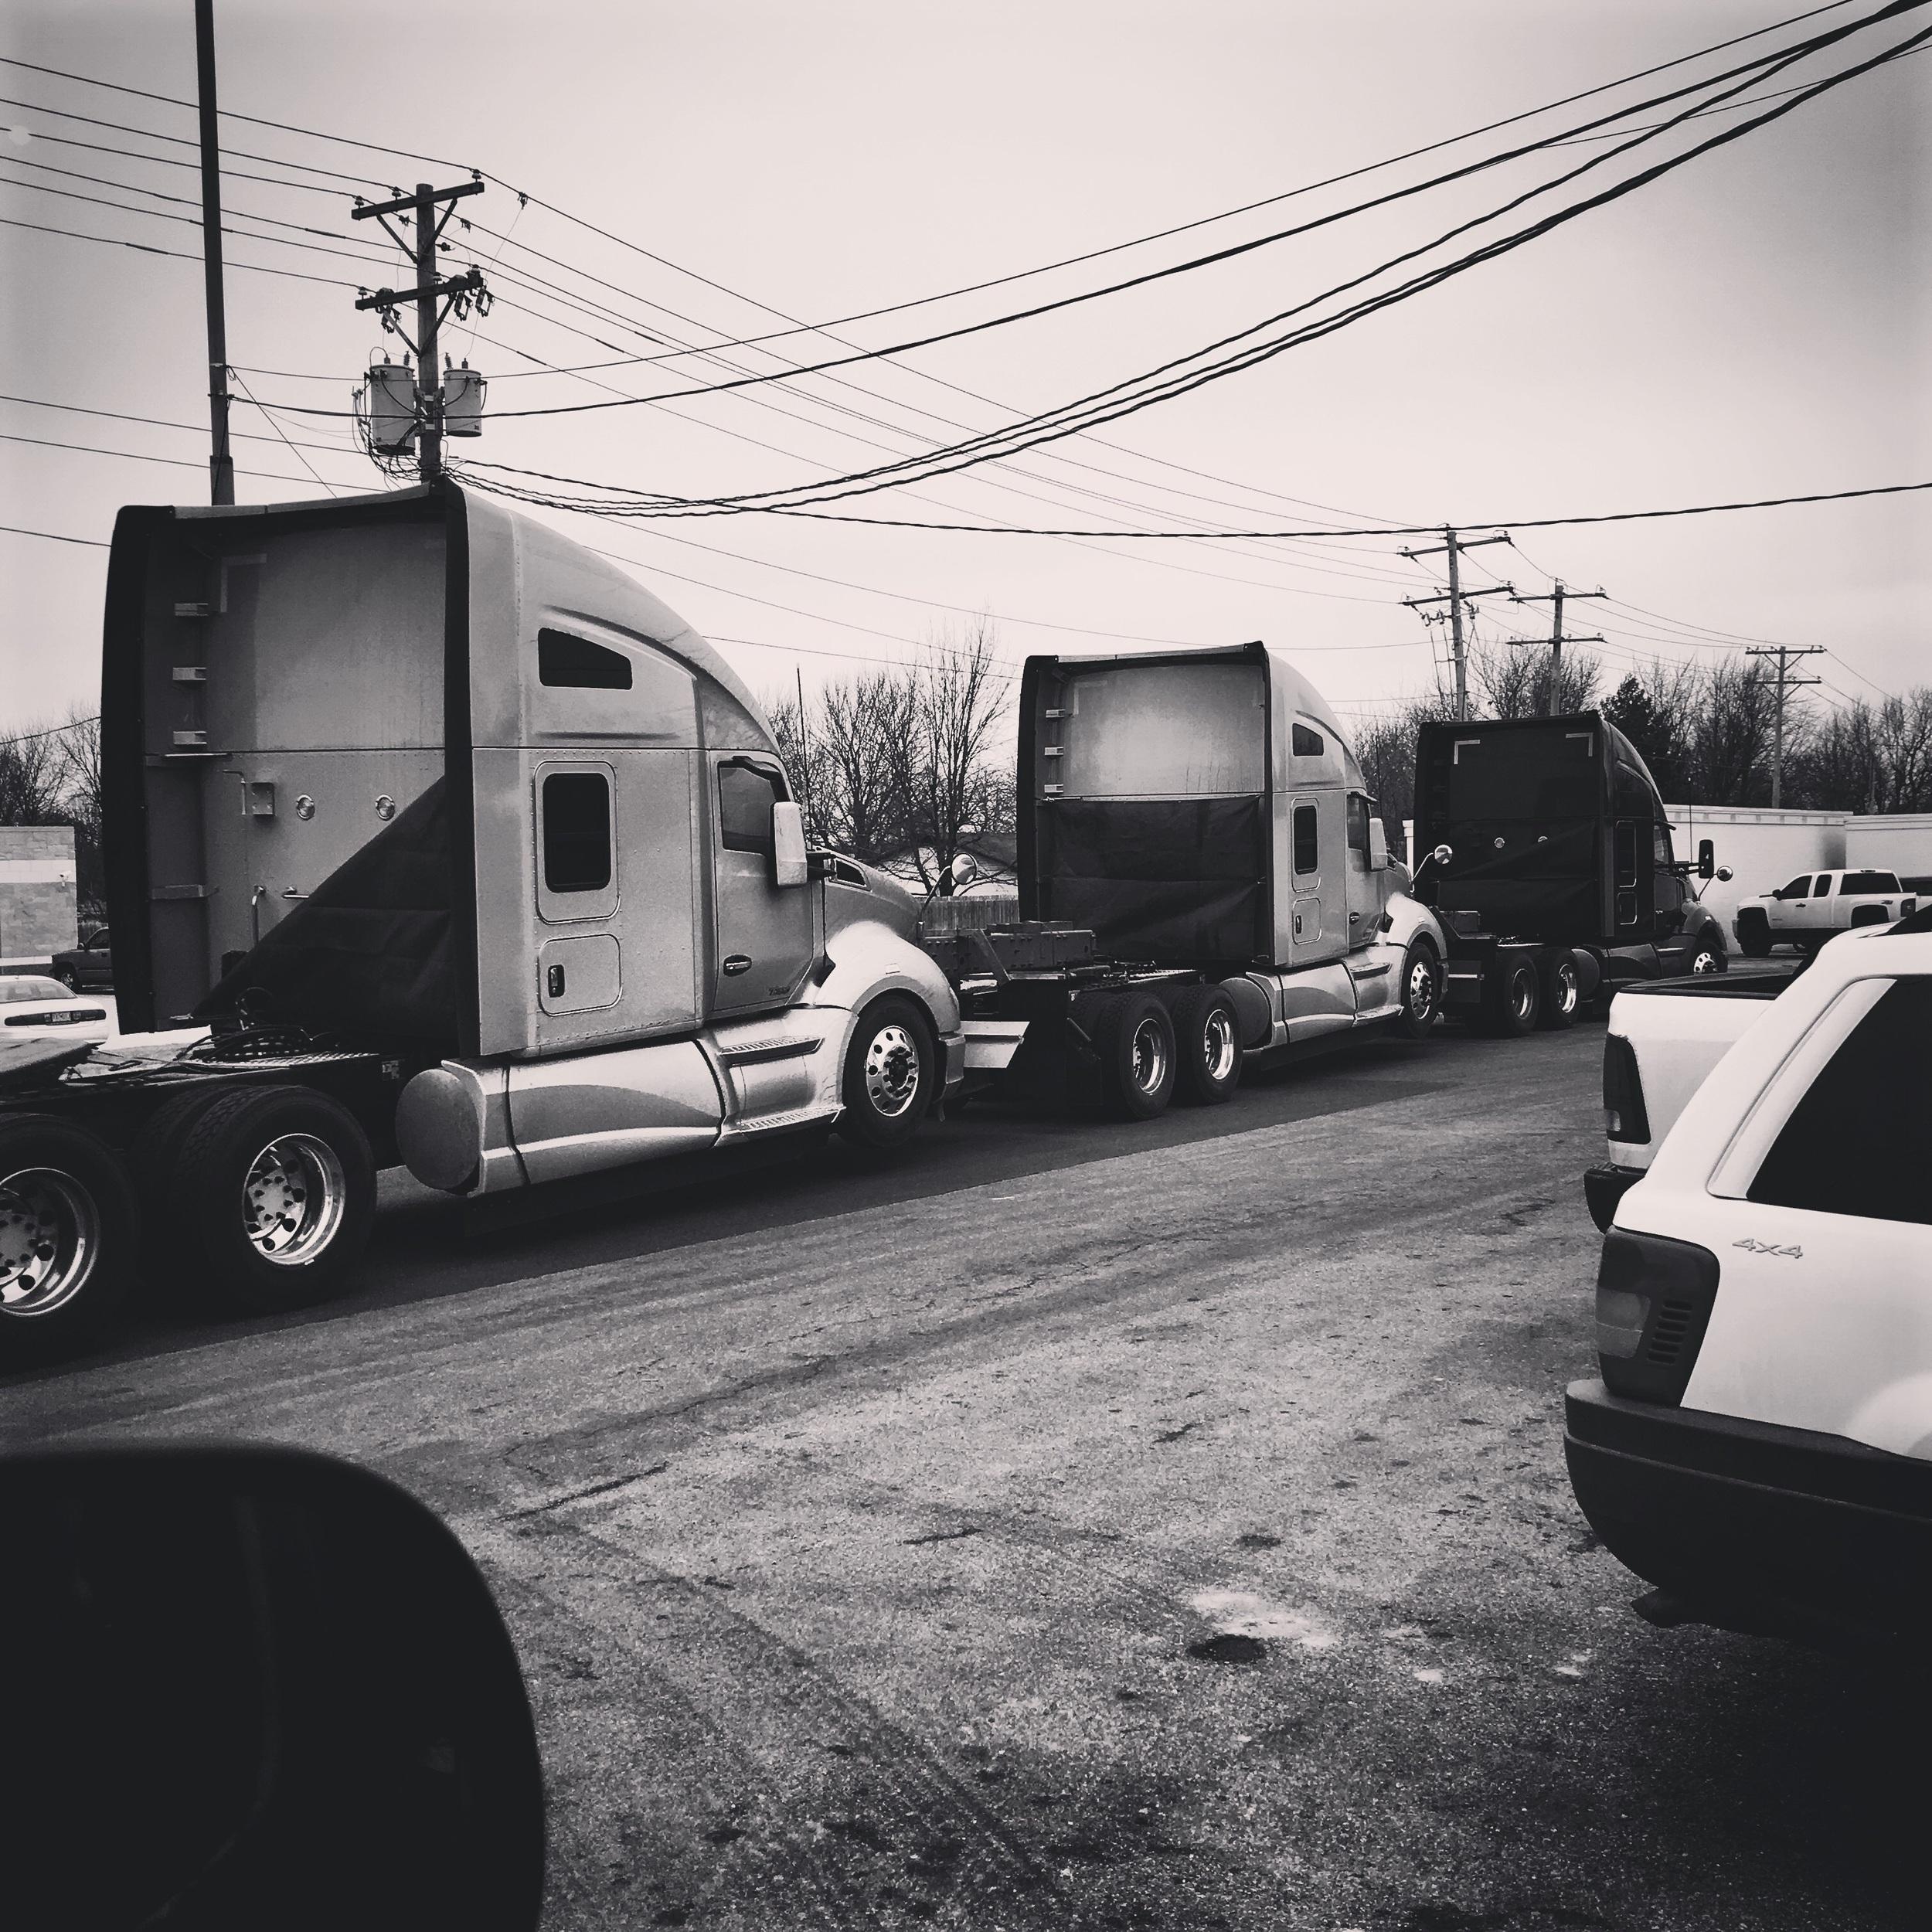 ...on top of trucks